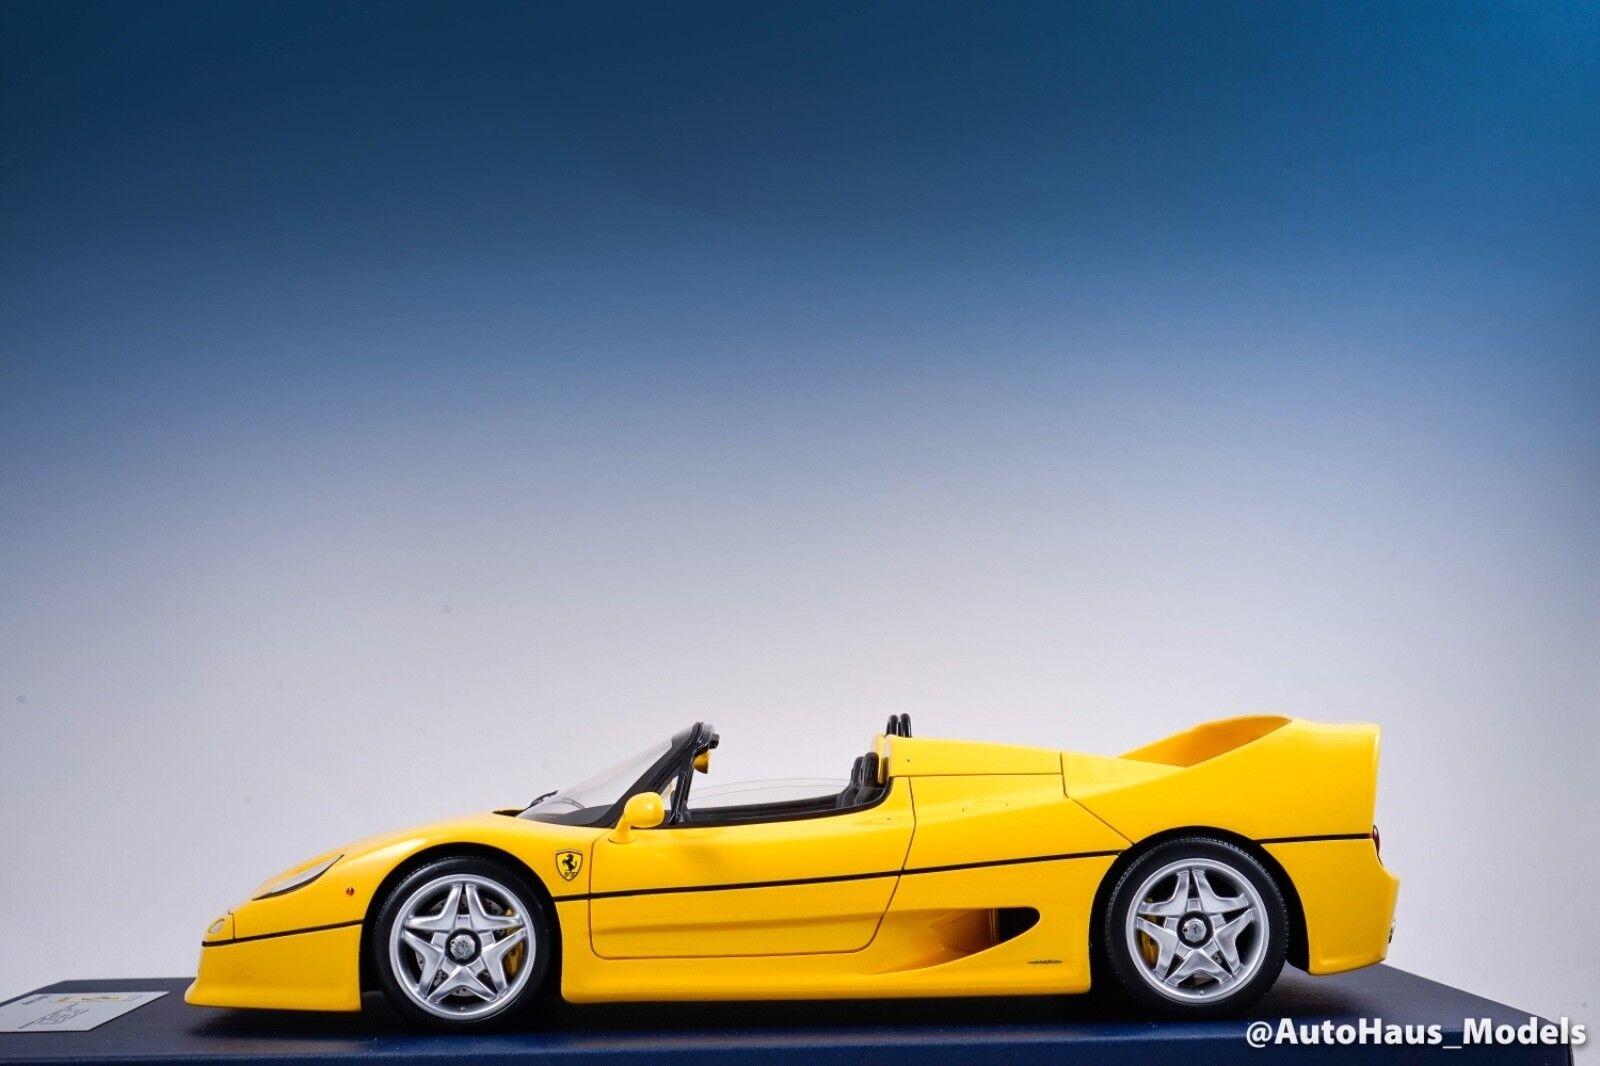 1 18 Looksmart MR Ferrari F50 Spider in Gelb on Blau Leather Base With Display